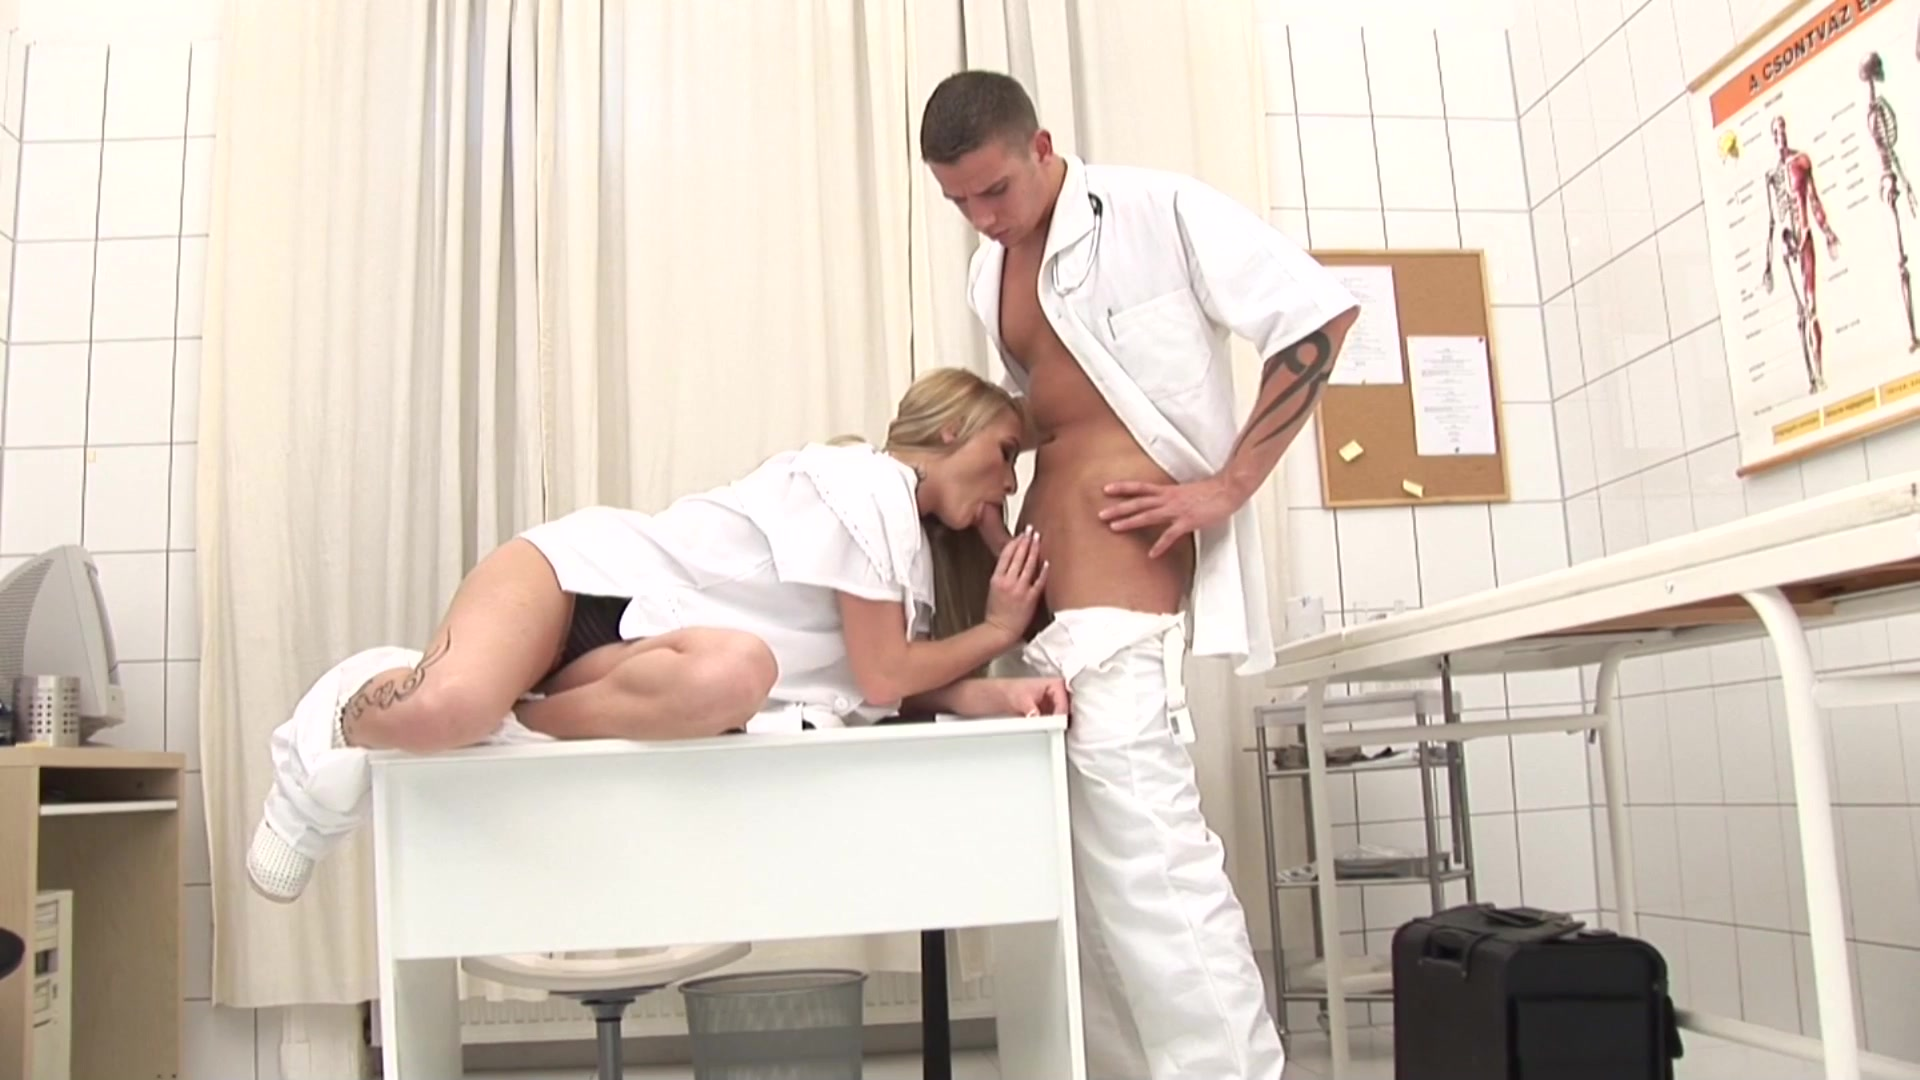 Dirty Nurses Porn 16